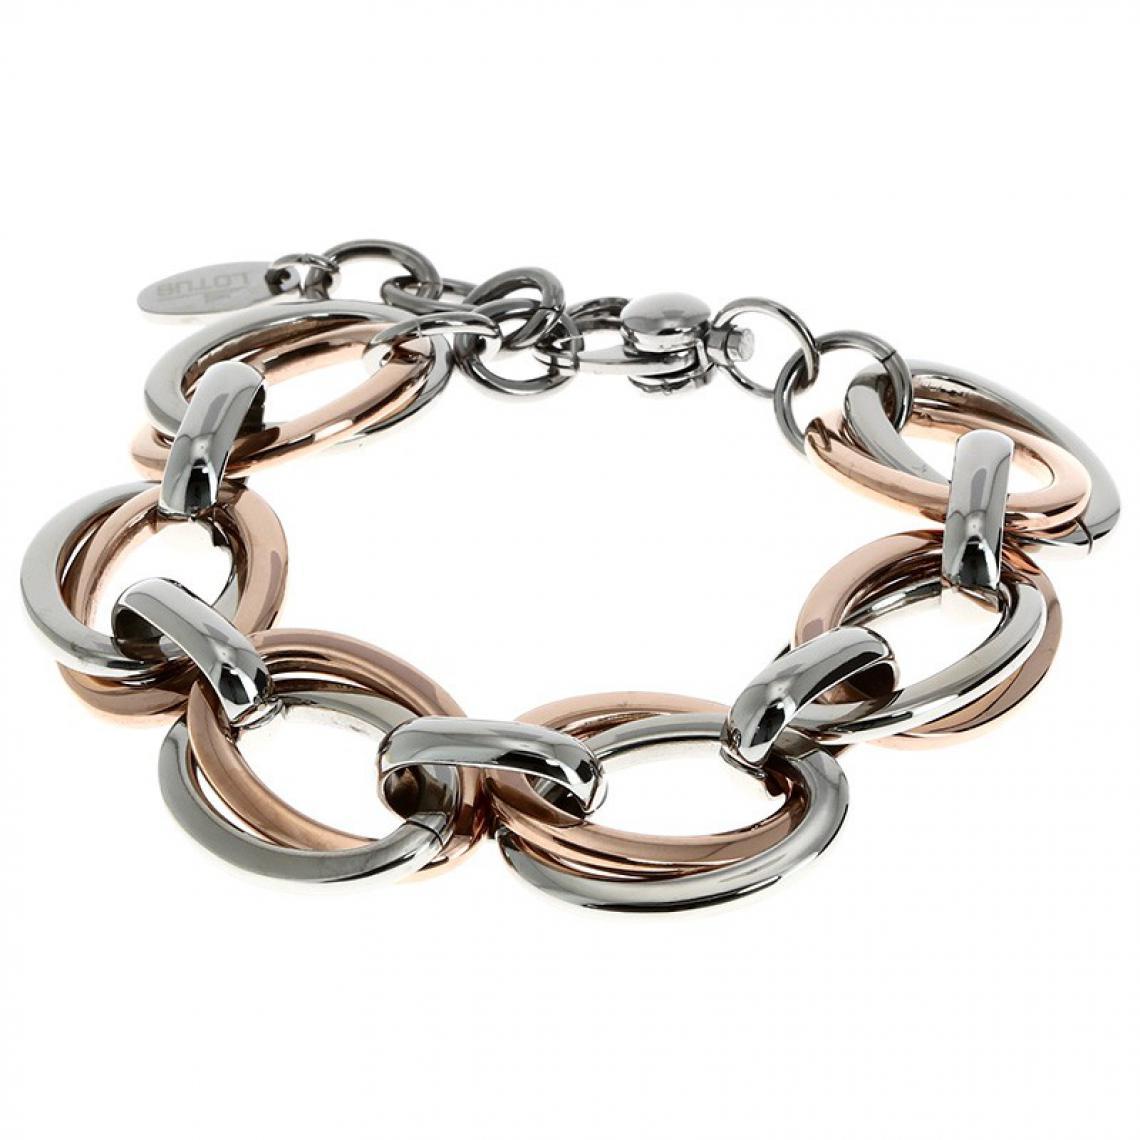 Bracelet Lotus LS1616-2/3 - LS1616-2-3 - Modalova